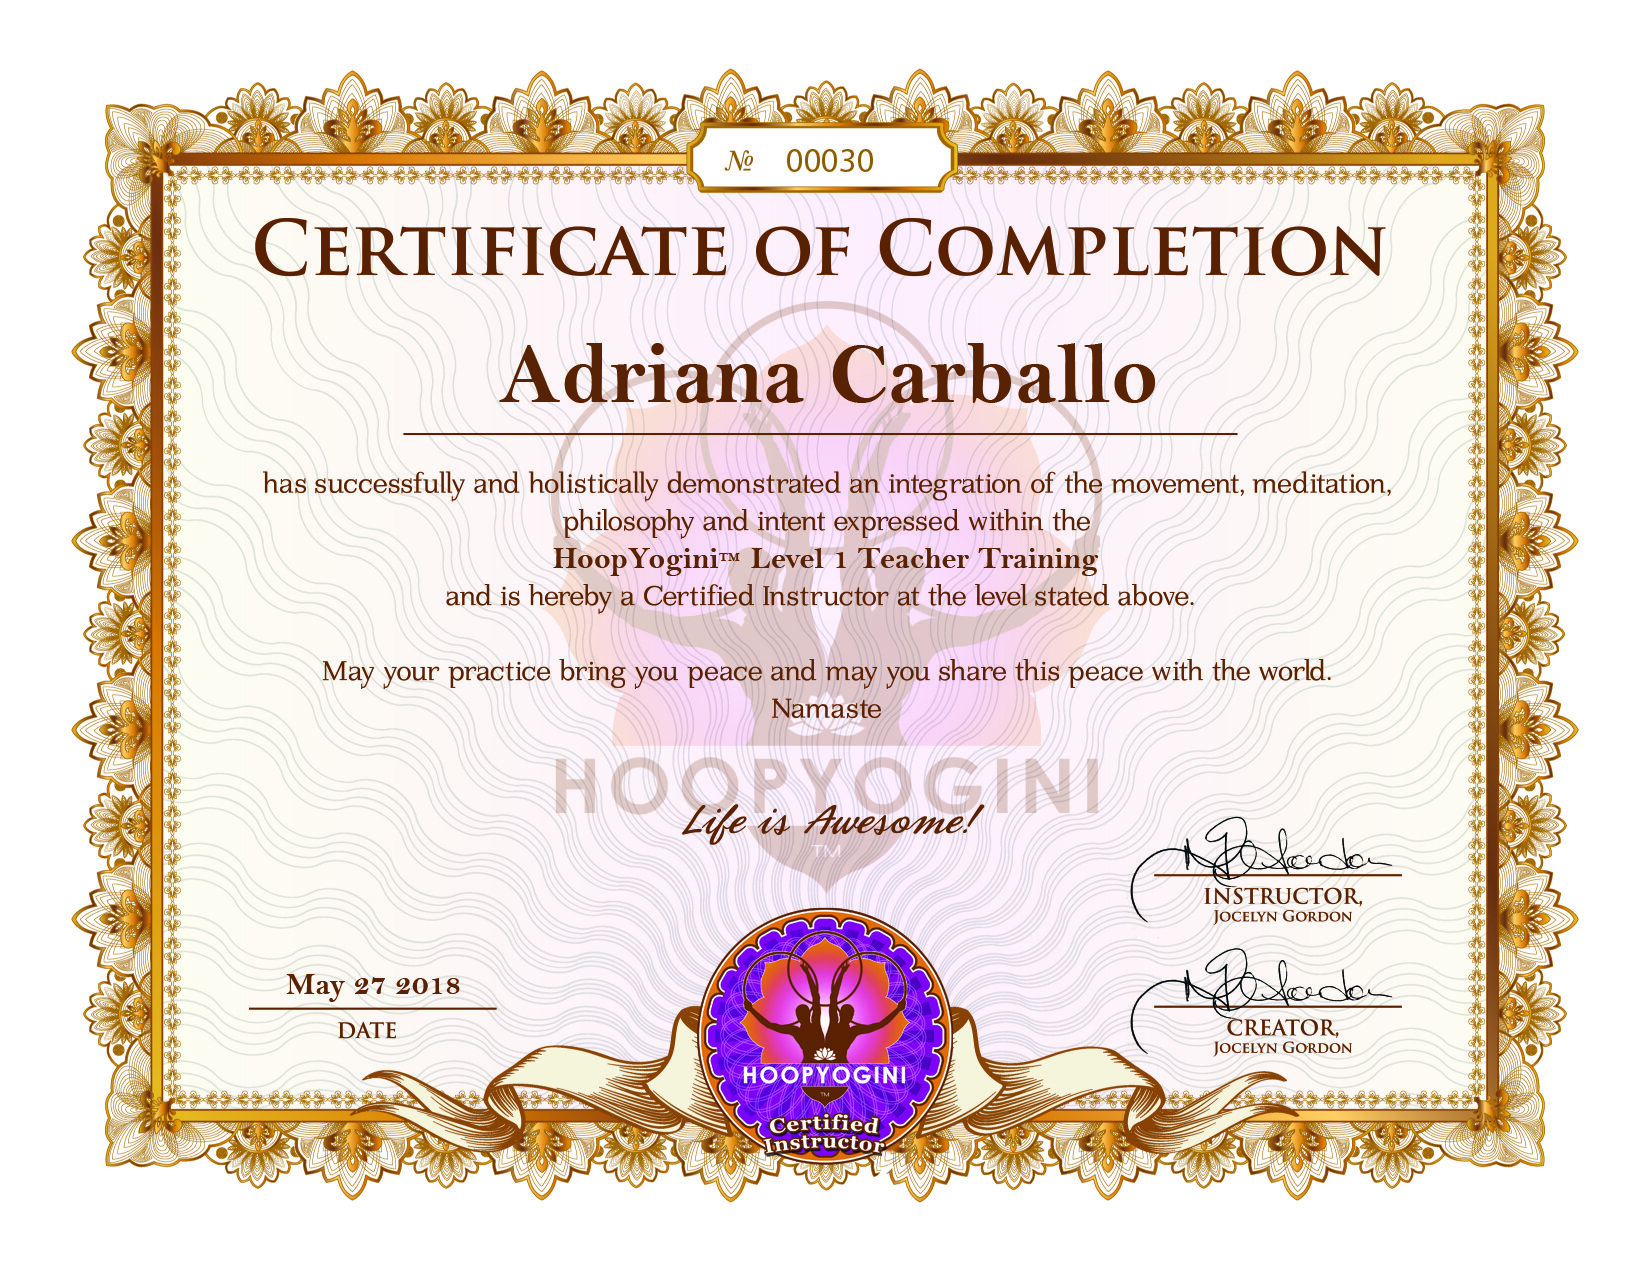 HoopYogini_Certificate_Level 1 teacher training - Adriana Carballo-2 (1).jpg